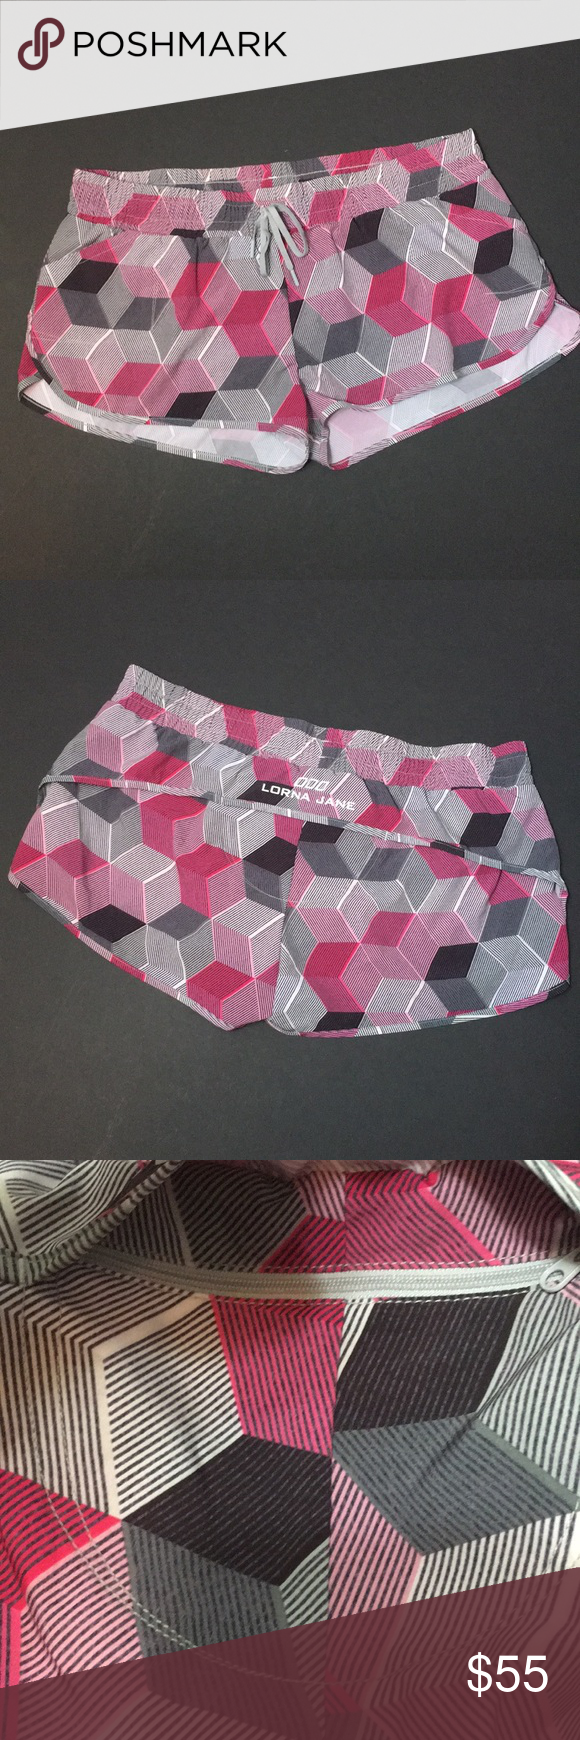 Lorna Jane Motivate Run Short • Sz L Square pattern